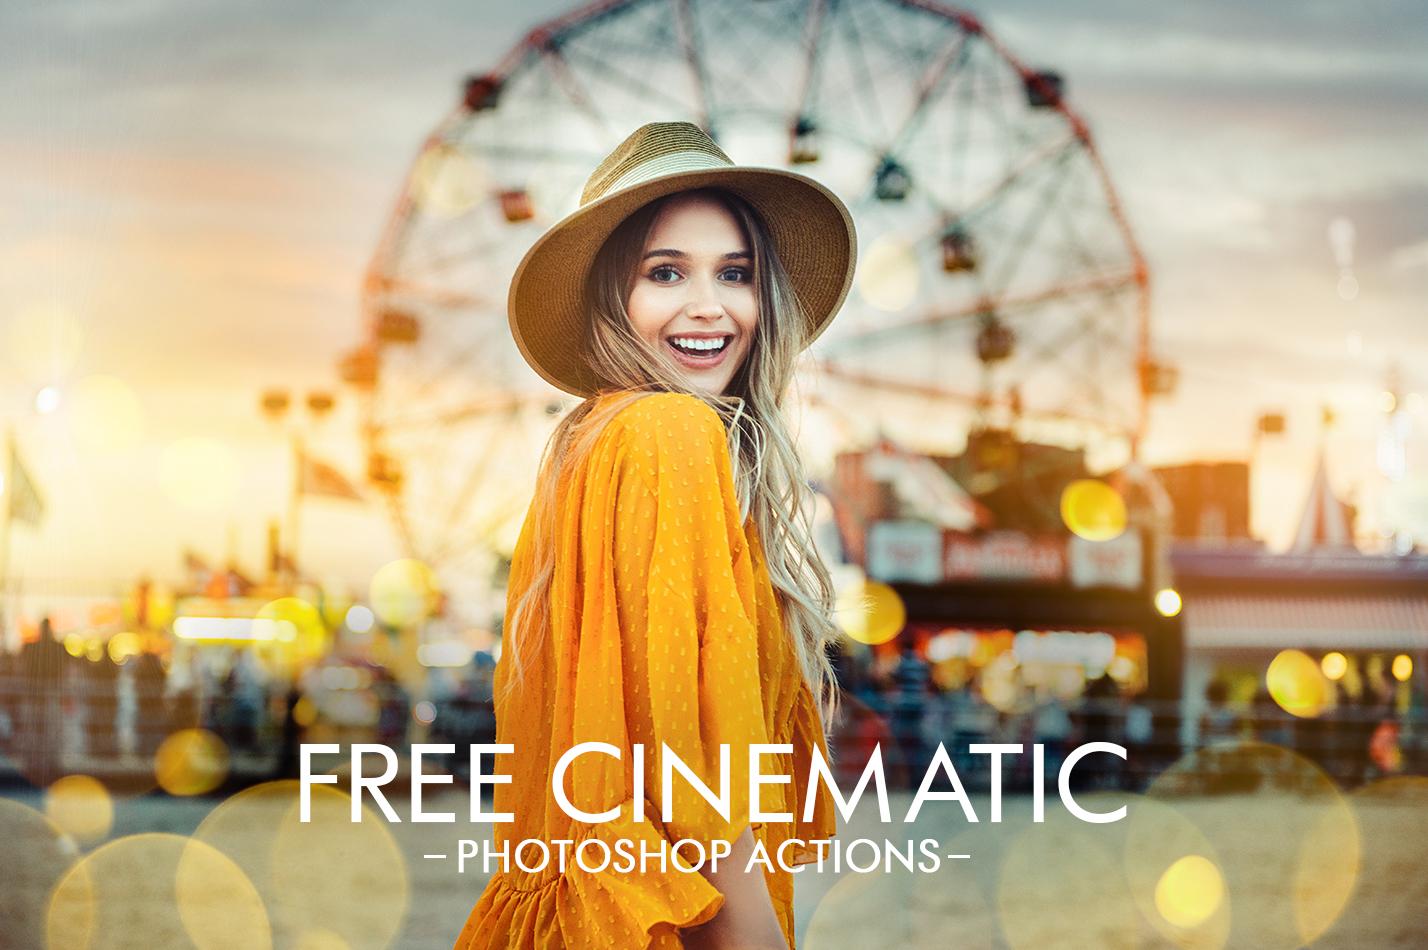 VSCO Actions Photoshop - Cinematic Look Photoshop Action